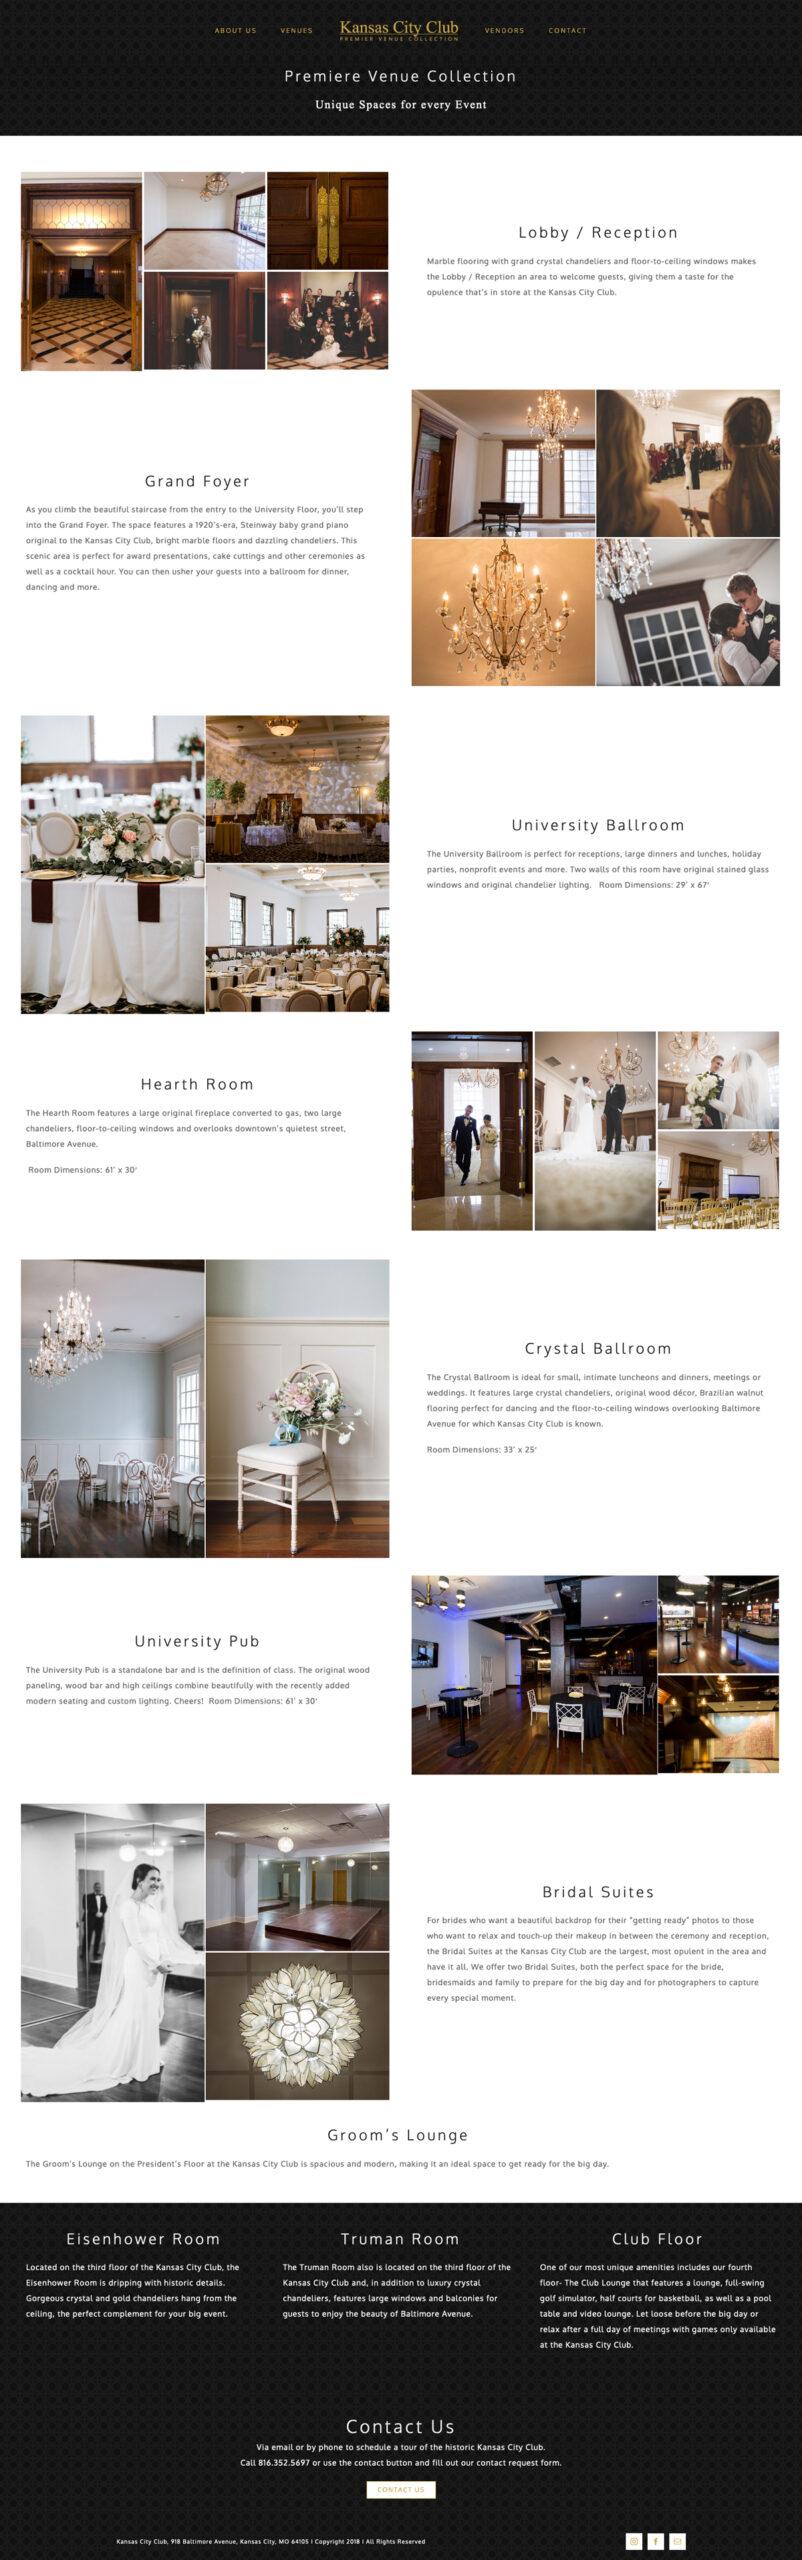 Custom Website Design for KCC